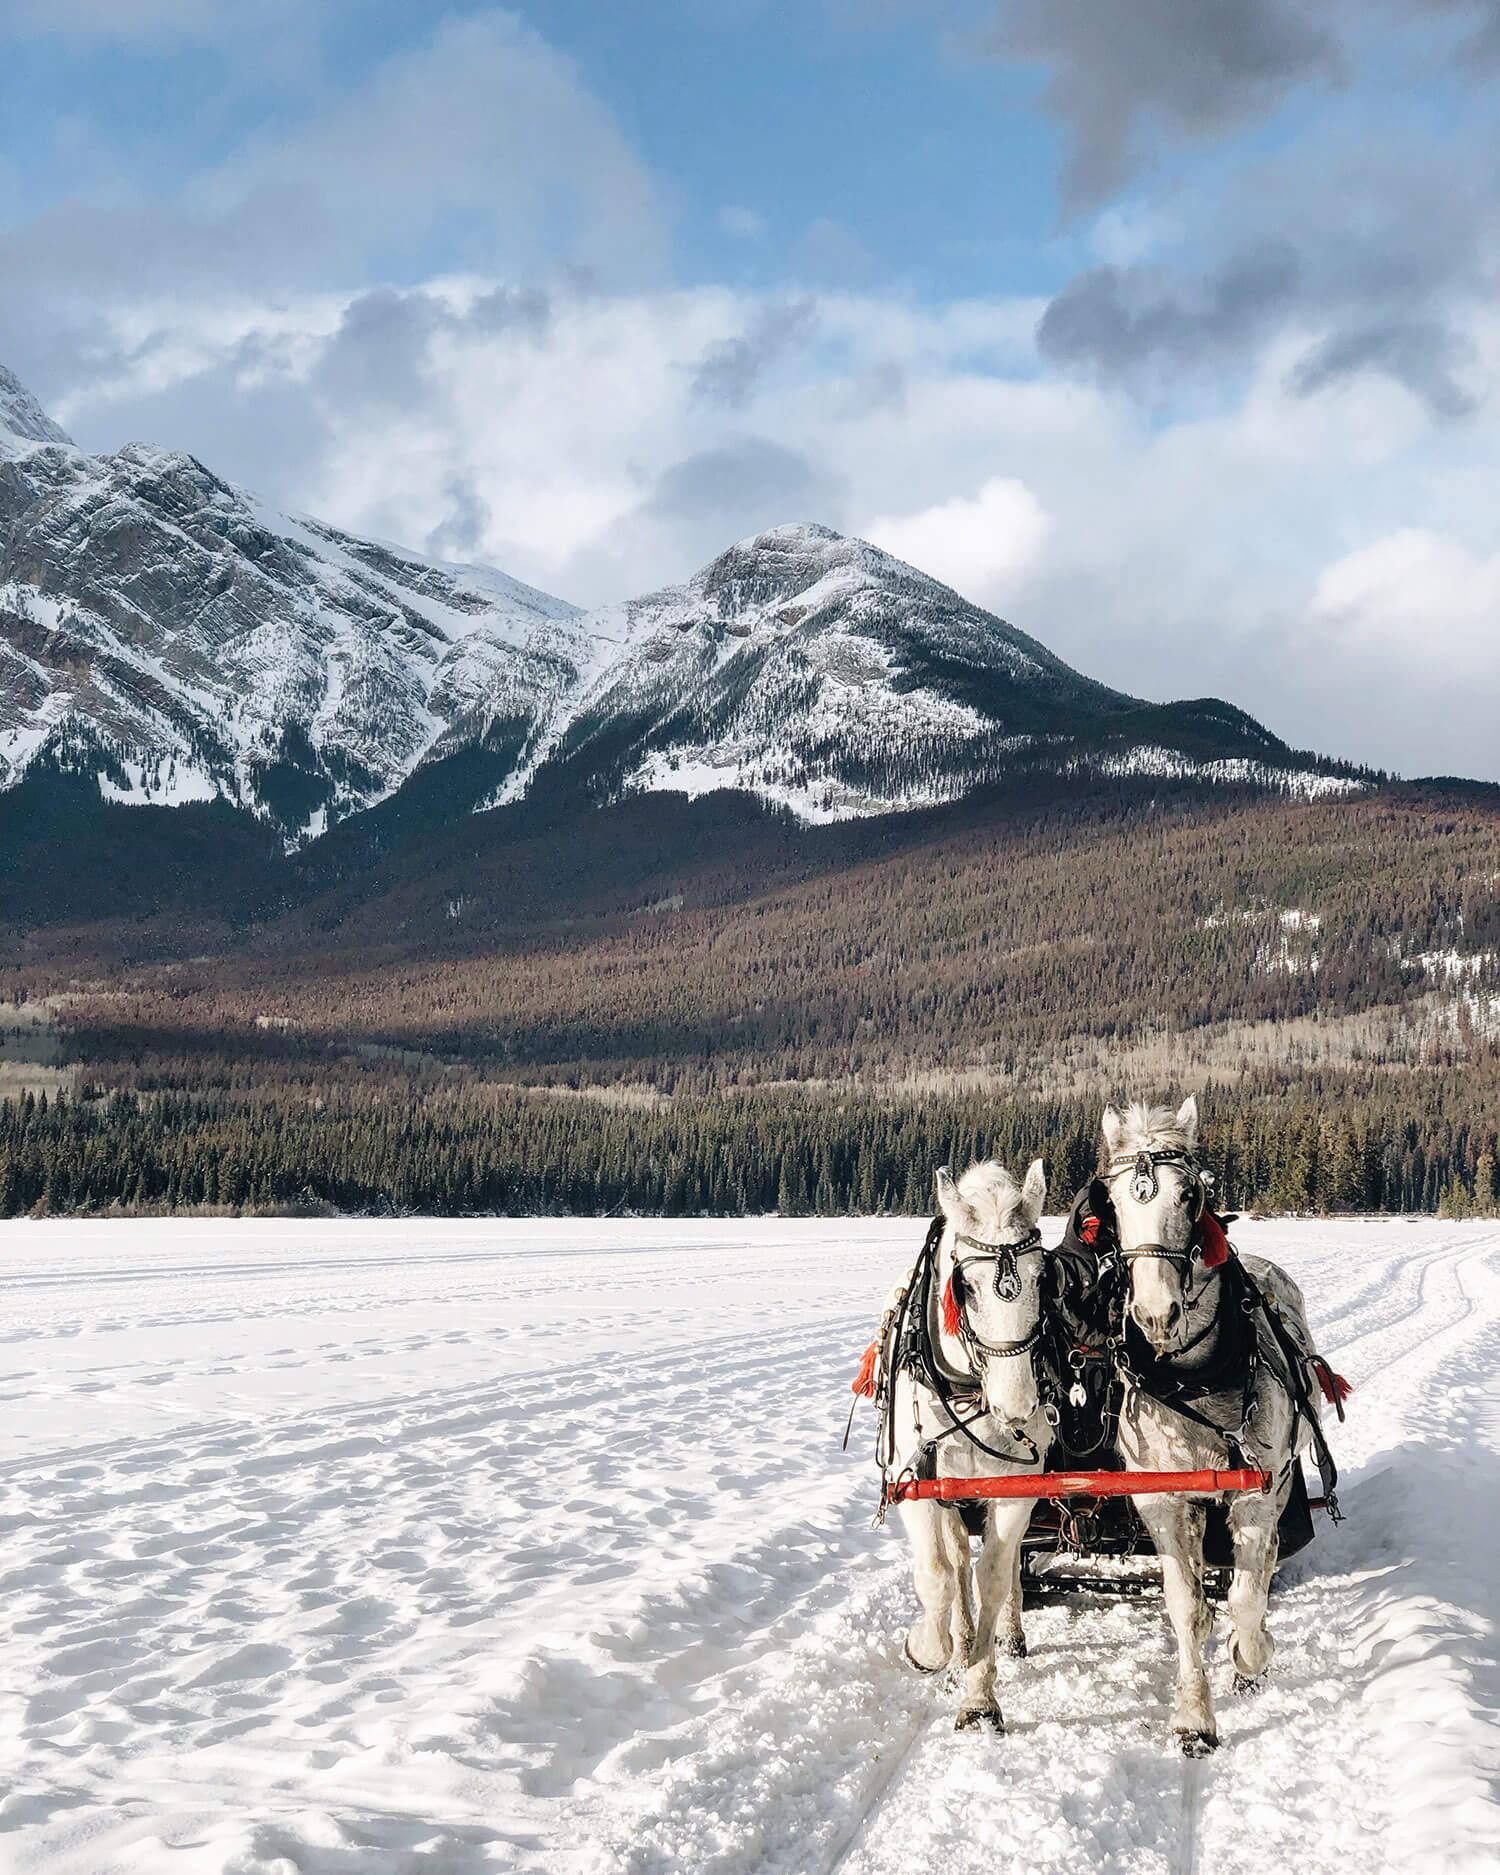 Pyramid Lake Horse Drawn Sleigh Rides Tourism Jasper Explore Alberta Canada